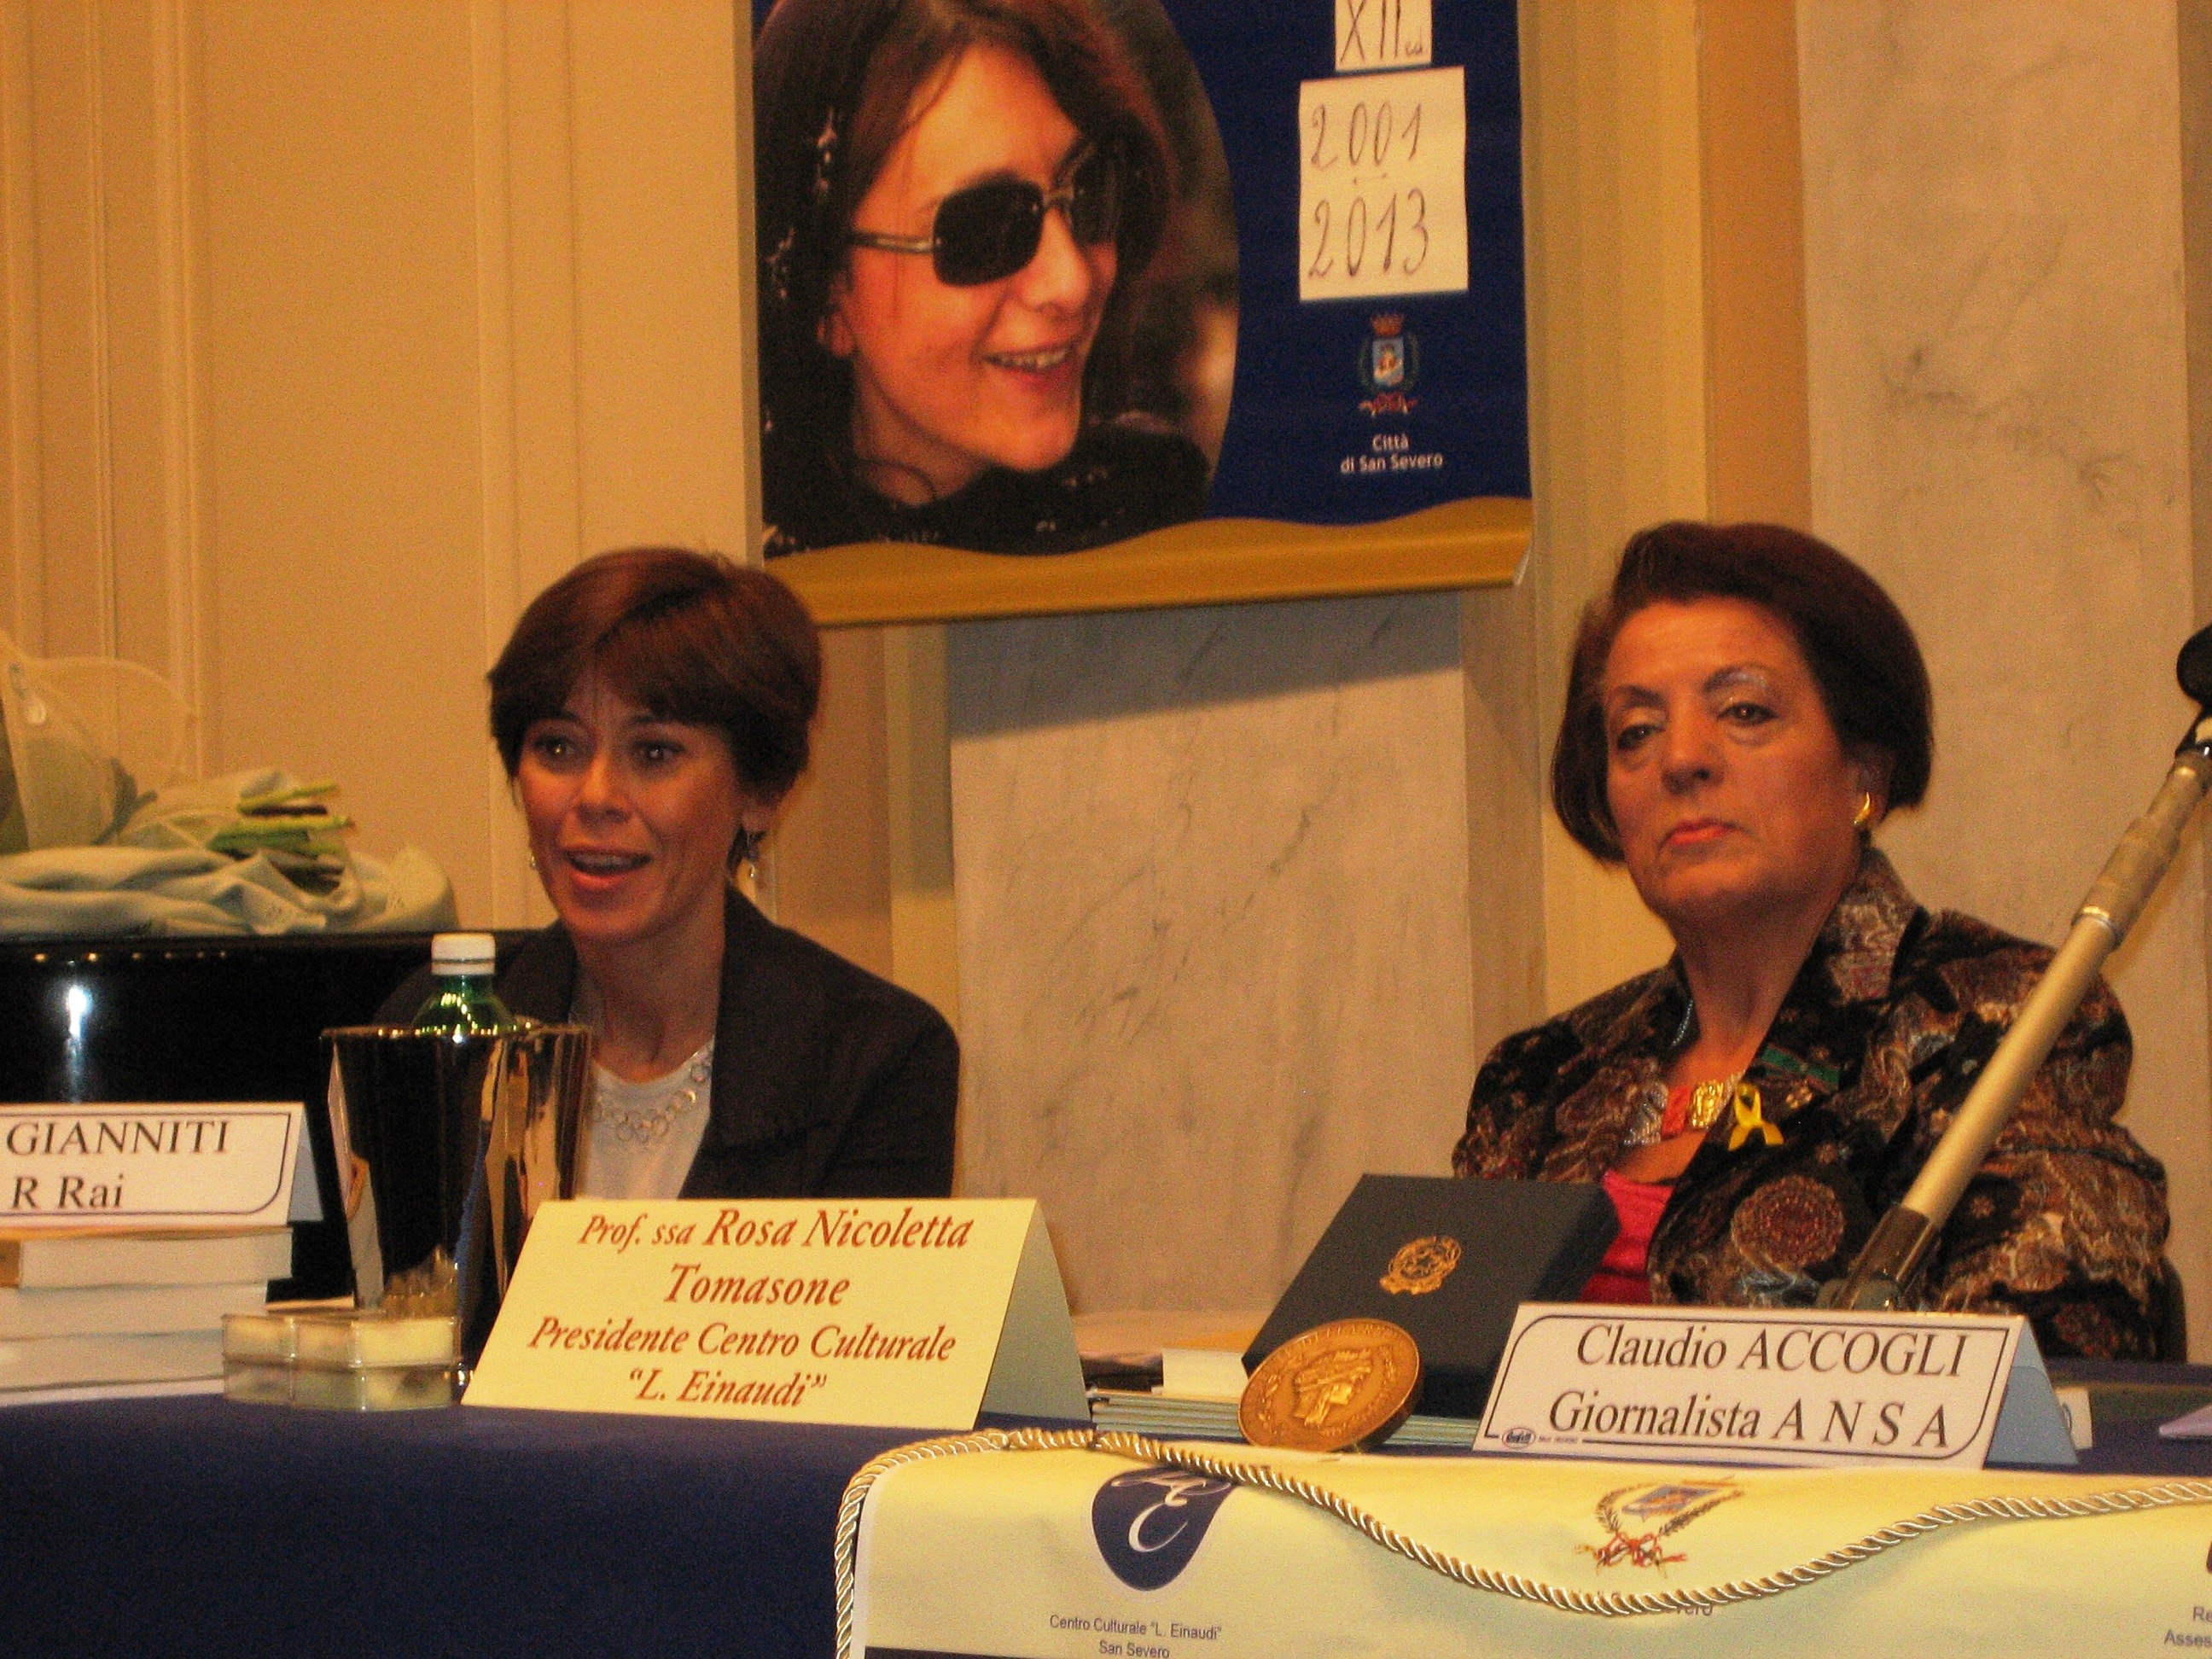 2014 Maria Giannitti